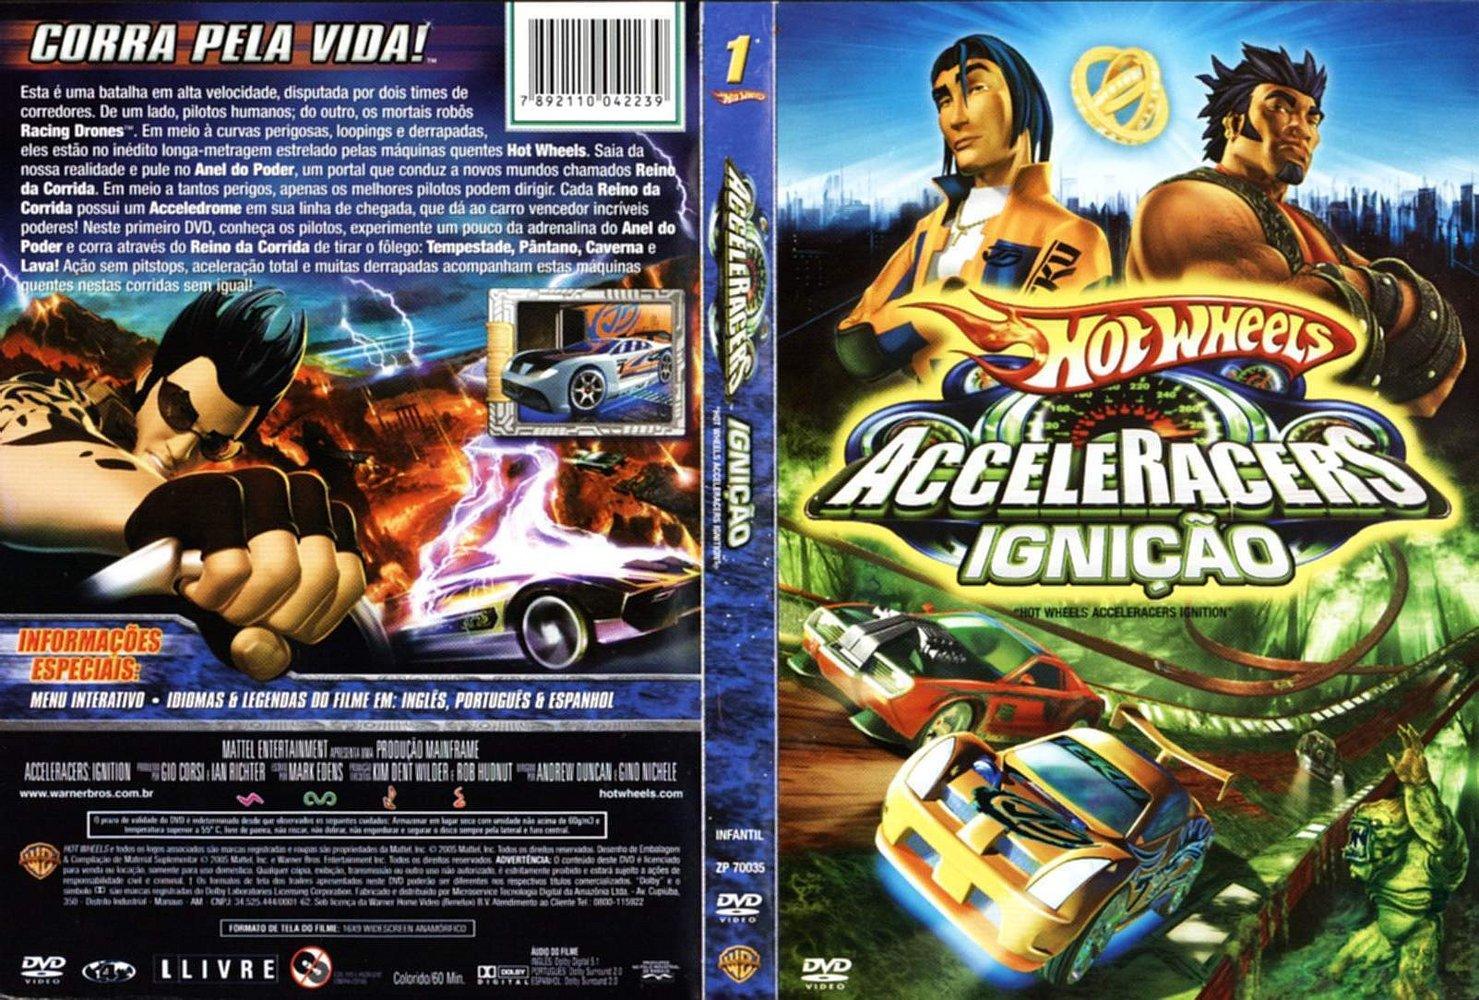 Filme Do Hot Wheels for capas de filmes: hot wheels acceleracers - ignition